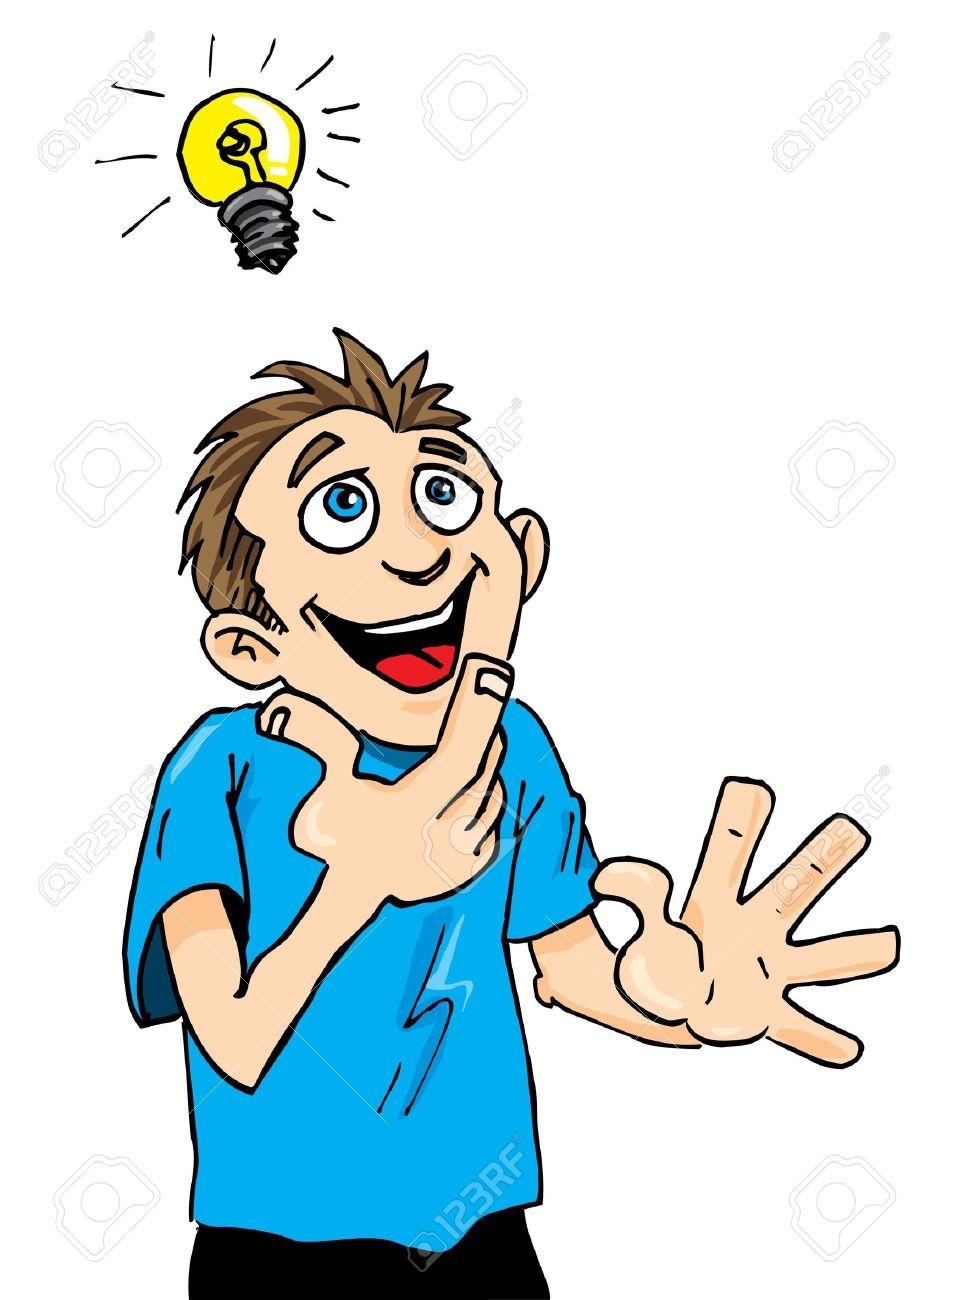 Cartoon Man Gets A Bright Idea. A Light Bulb Above His Head Stock Vector